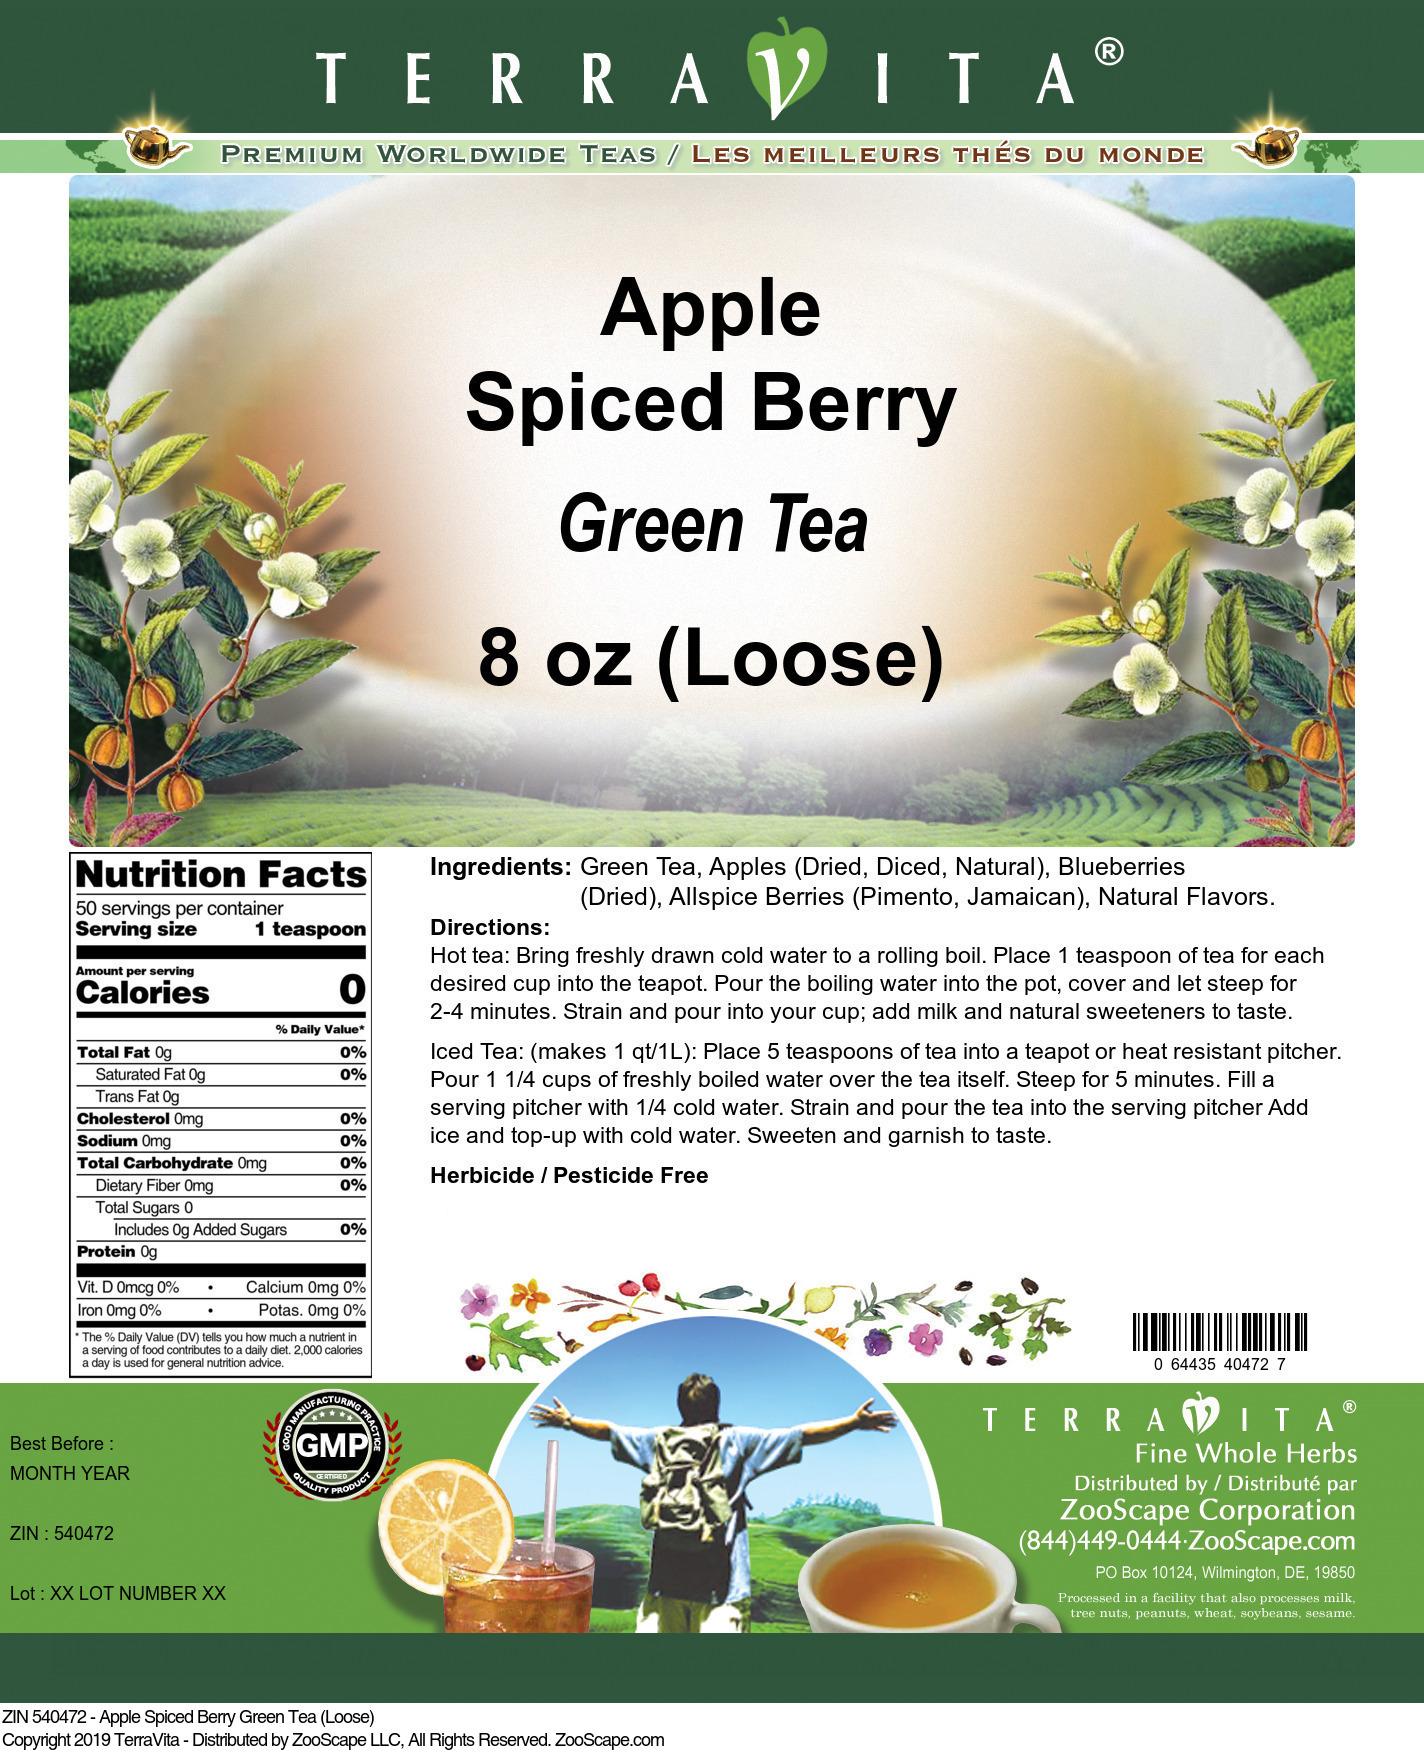 Apple Spiced Berry Green Tea (Loose)